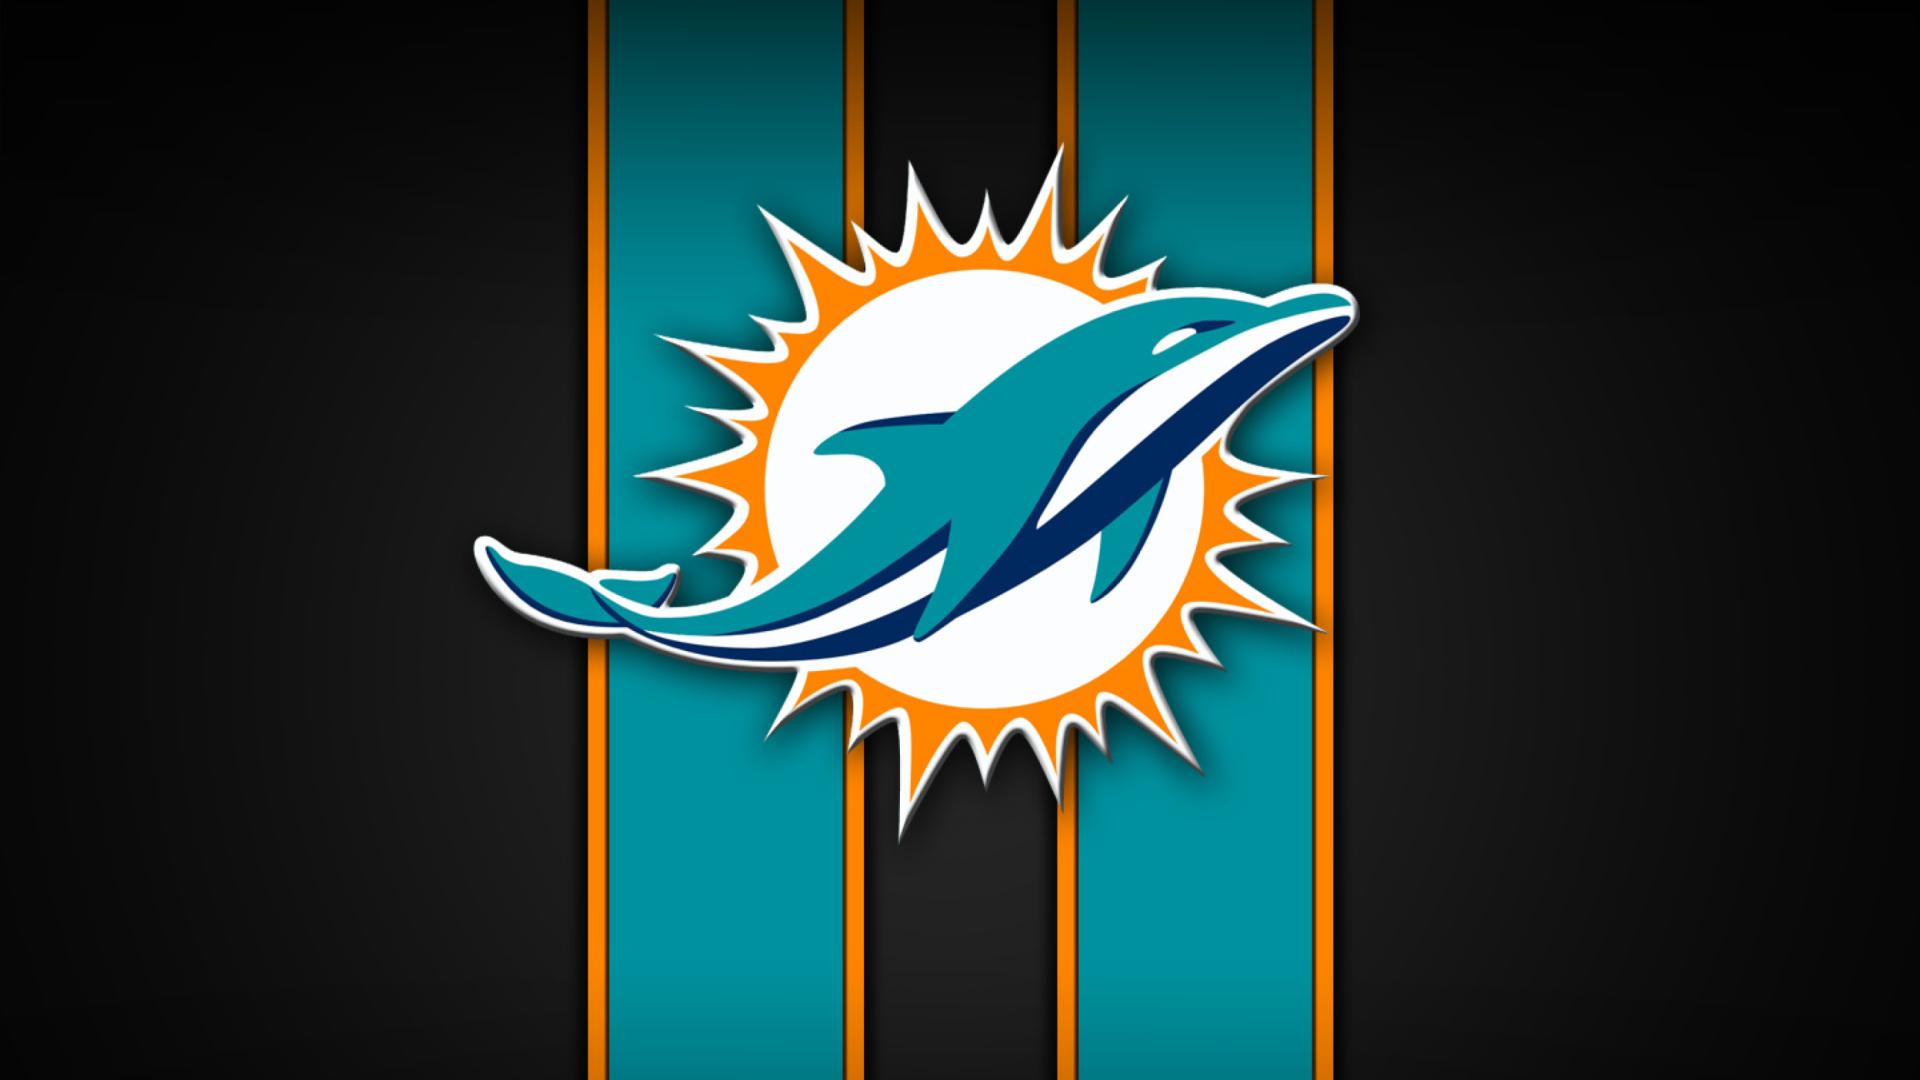 Miami Dolphins wallpaper 1080p